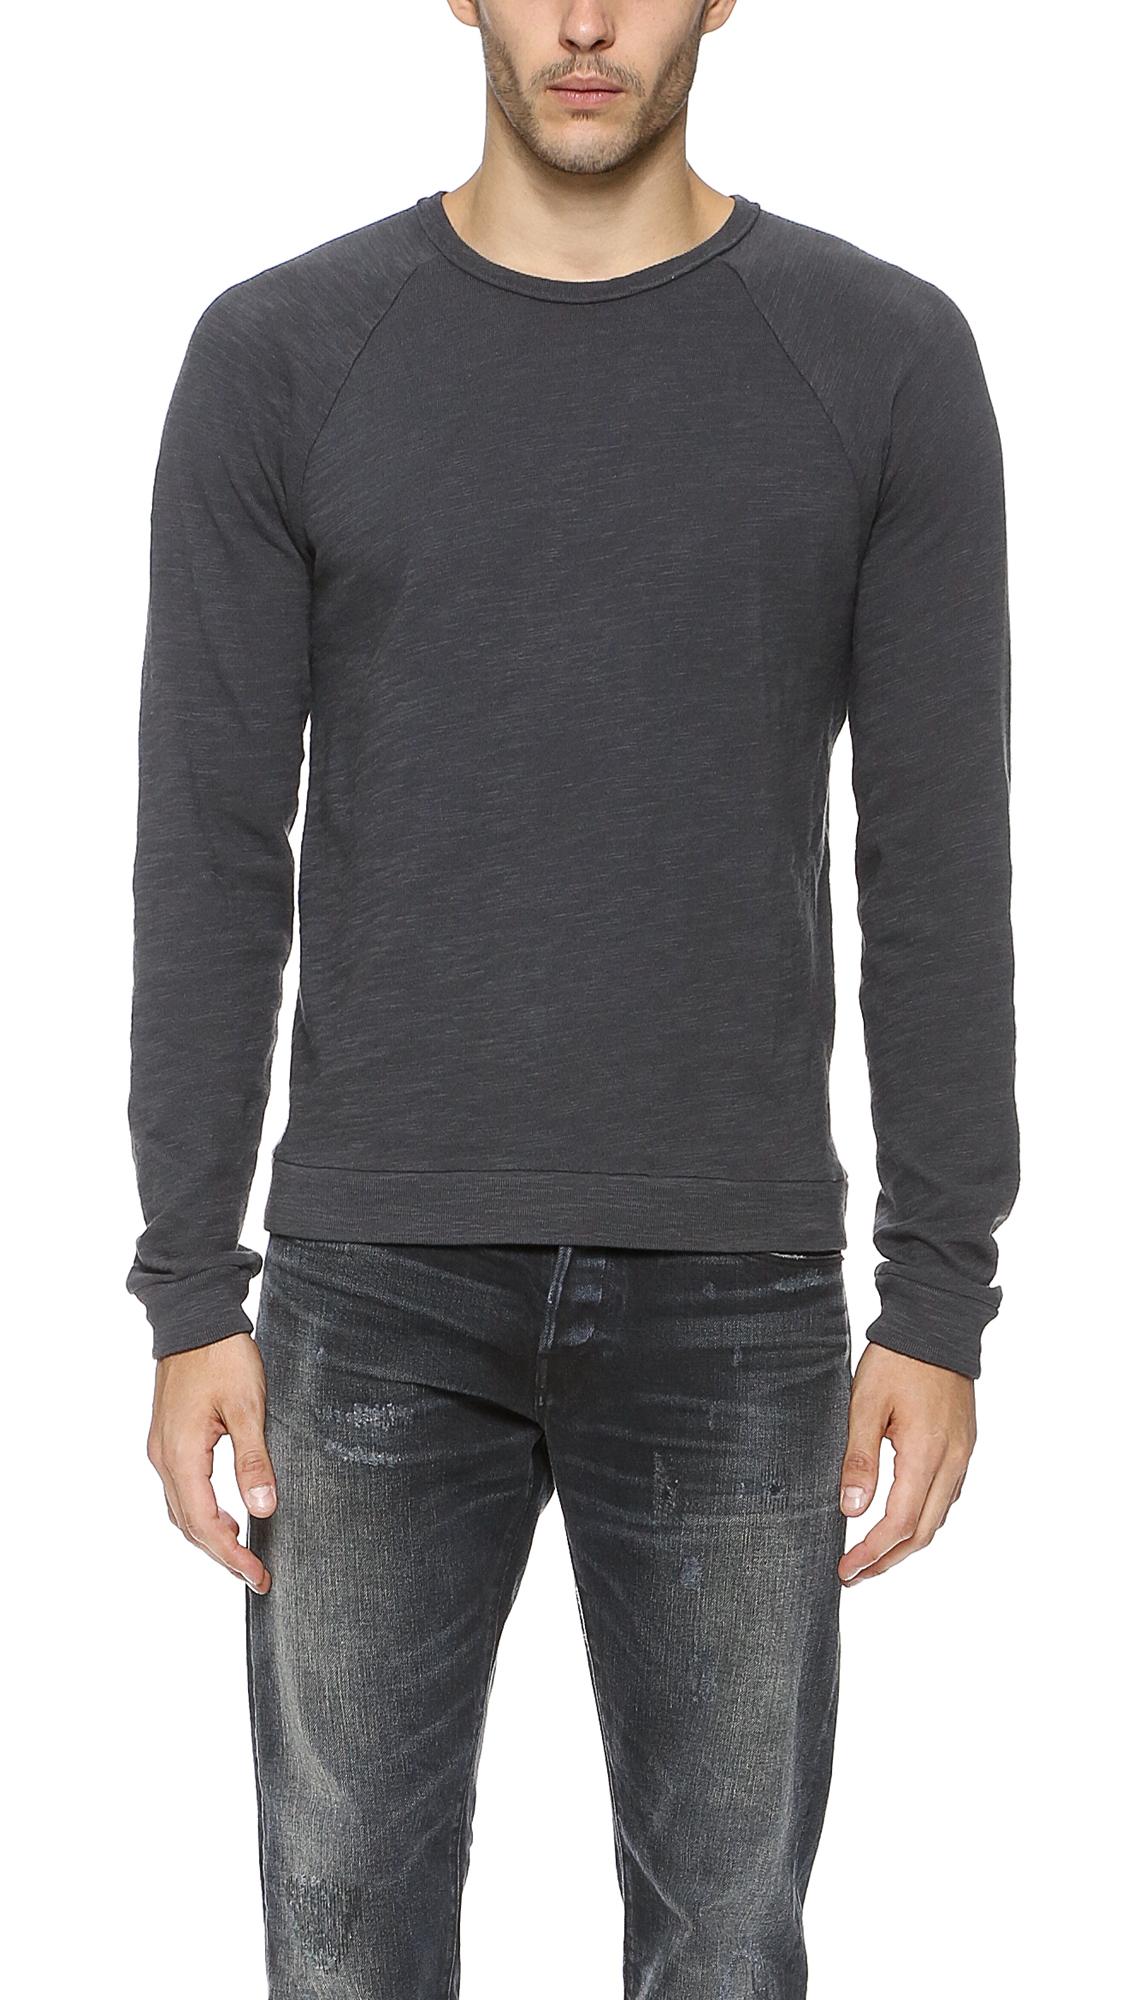 Rag bone long sleeve raglan t shirt in black for men lyst for Rag and bone t shirts